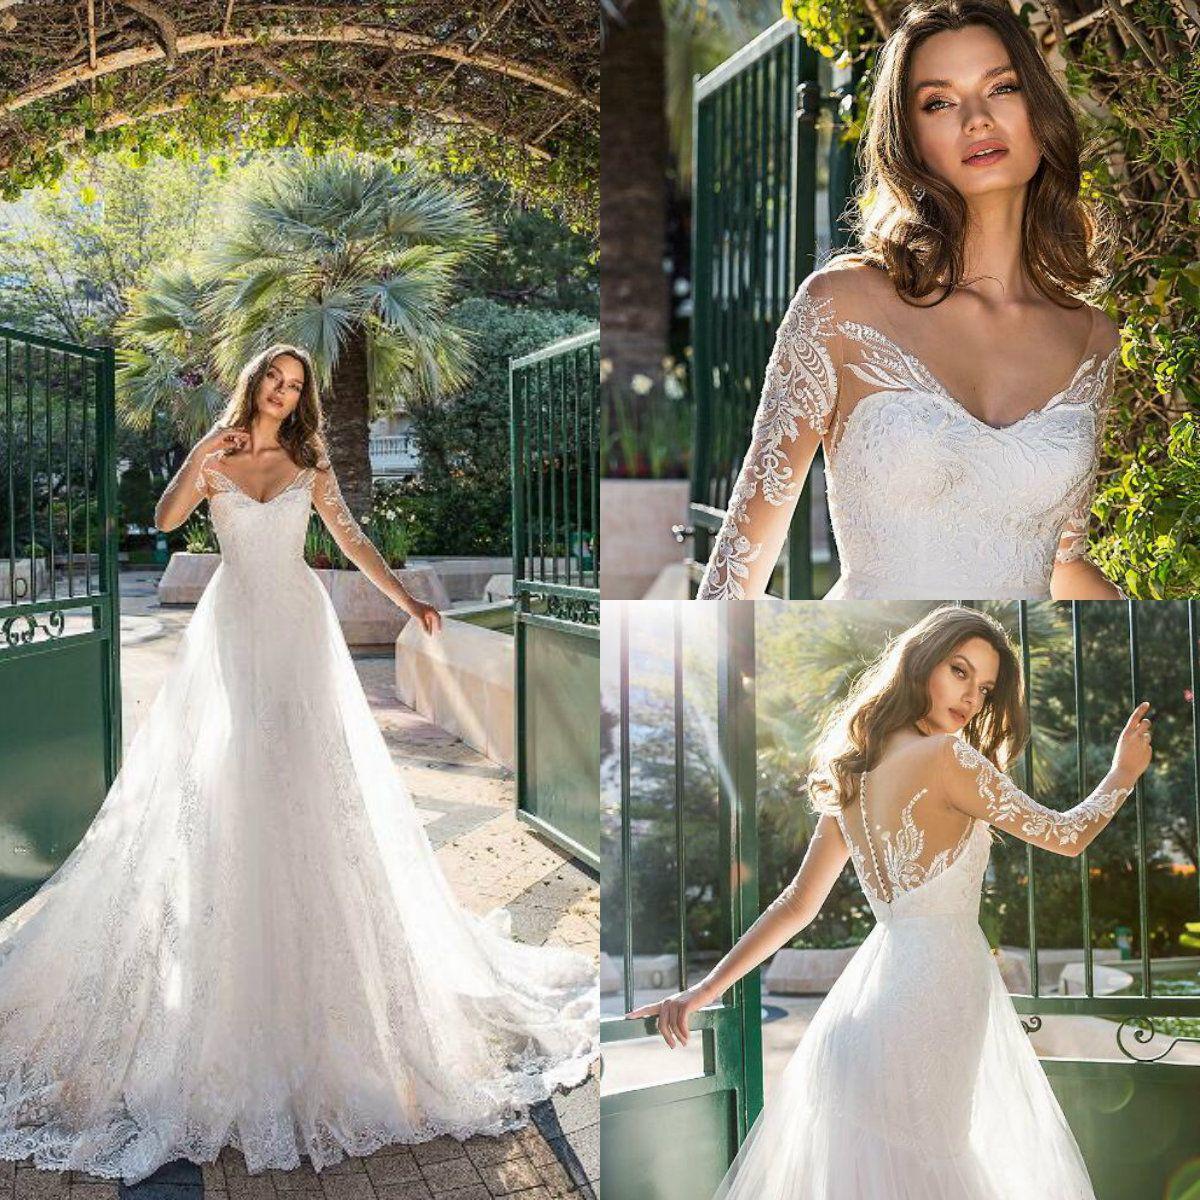 Spring Wedding Dresses.Brand 2019 Spring Wedding Dress Sheer Long Sleeve V Neck Lace Applique Bridal Gowns Mermaid Wedding Dresses With Detachable Overskirt